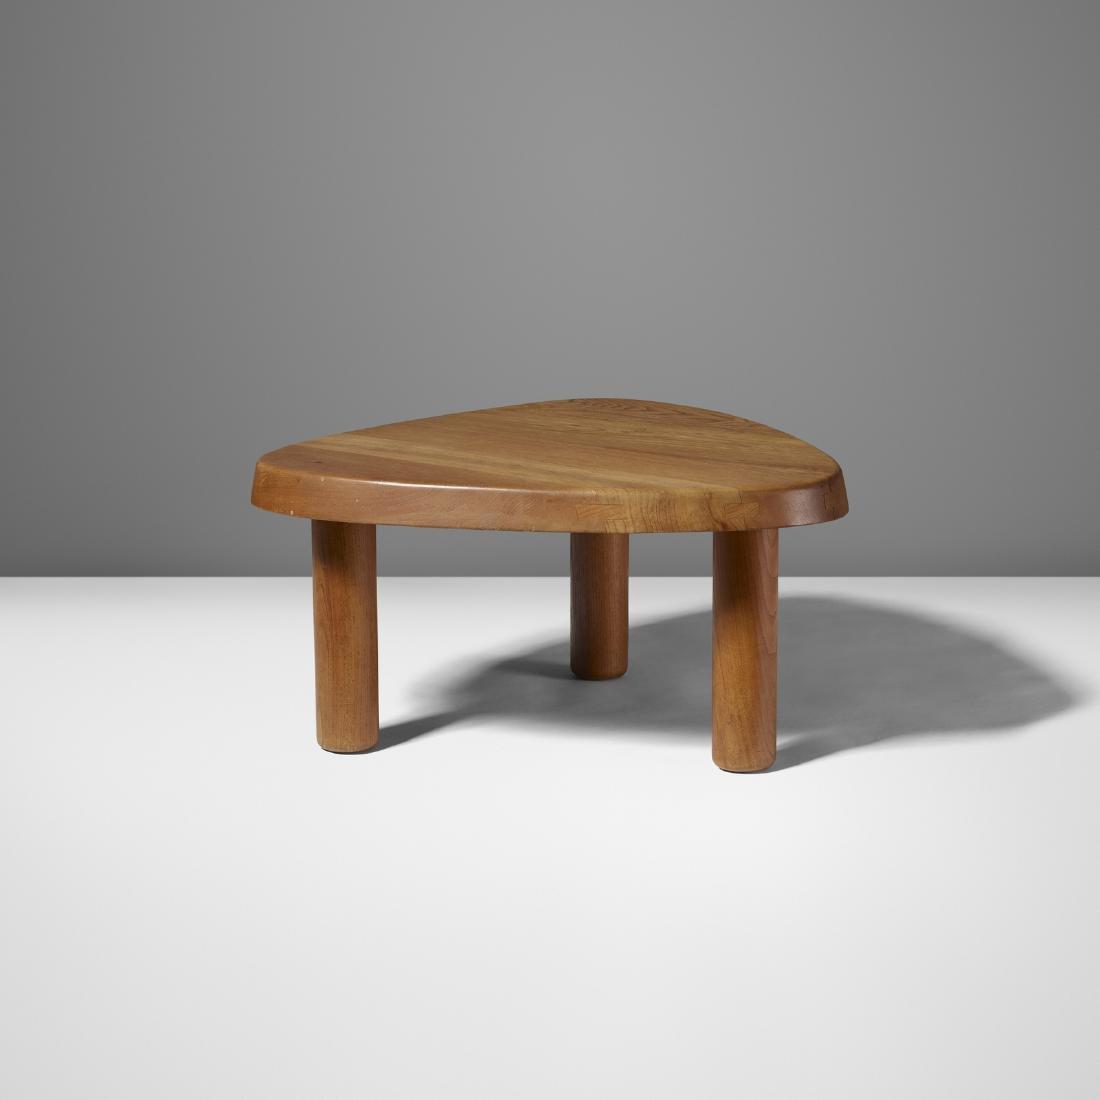 Pierre Chapo, coffee table